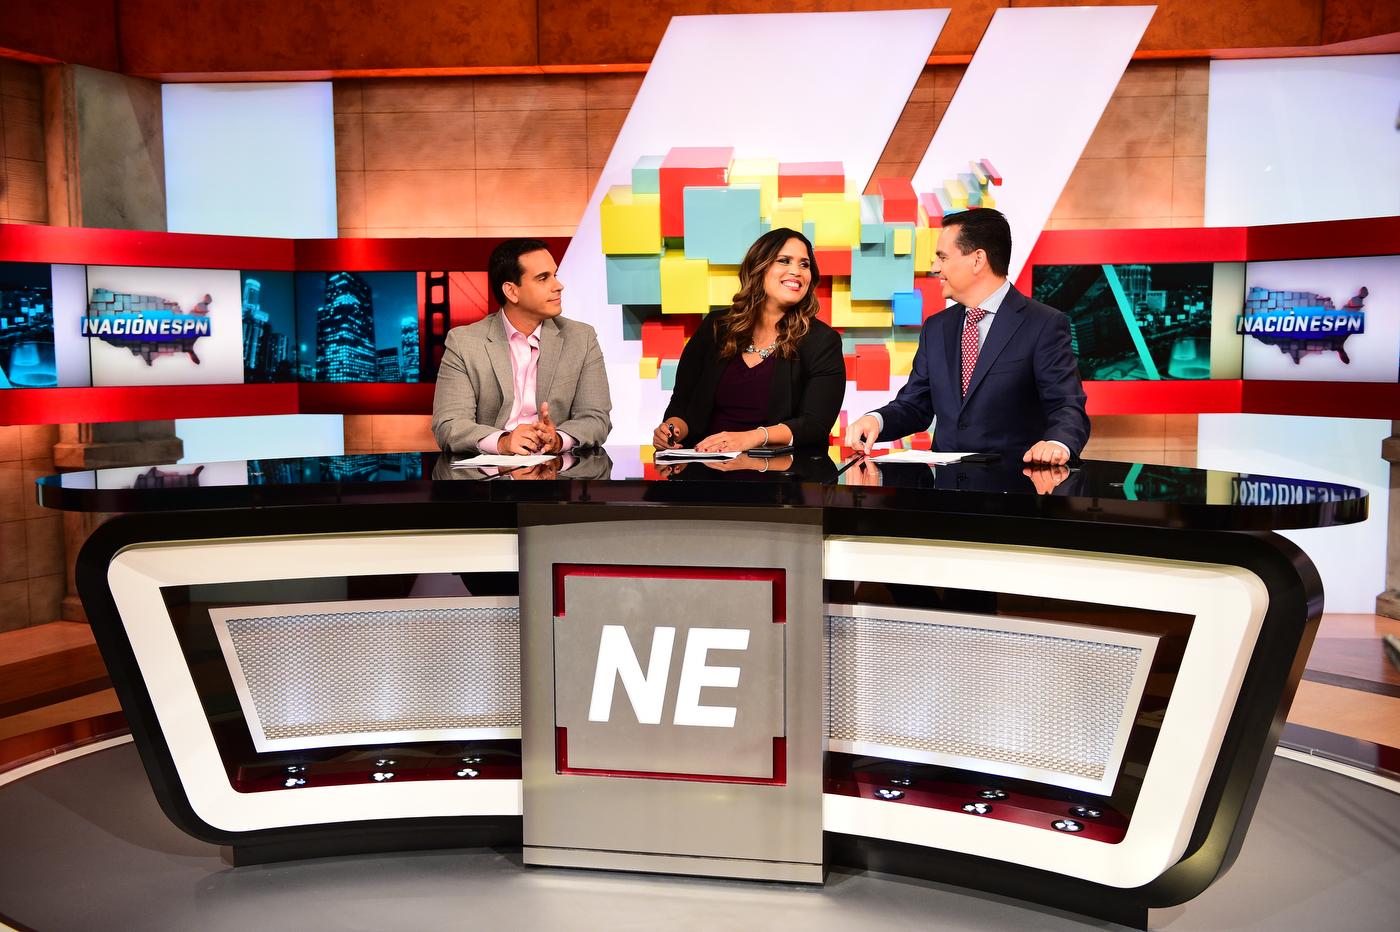 SportsNation Nacin ESPN Broadcast Set Design Gallery 1400x932